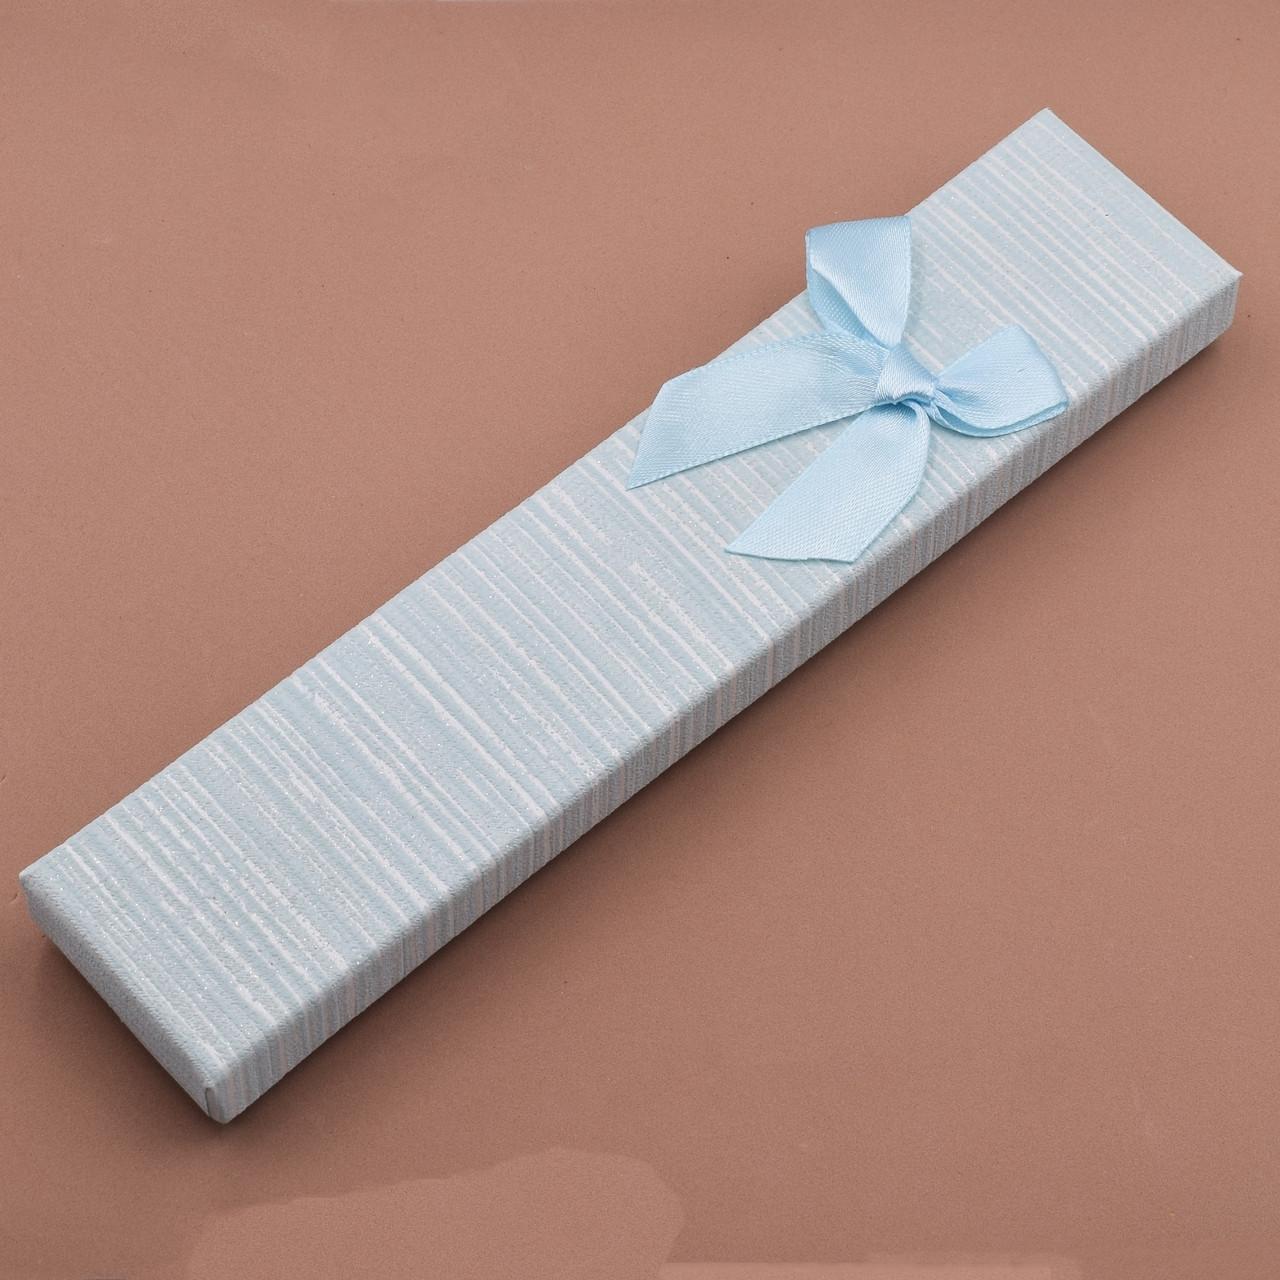 Футляр голубой 740169 для цепочек браслетов размер 21х4 см